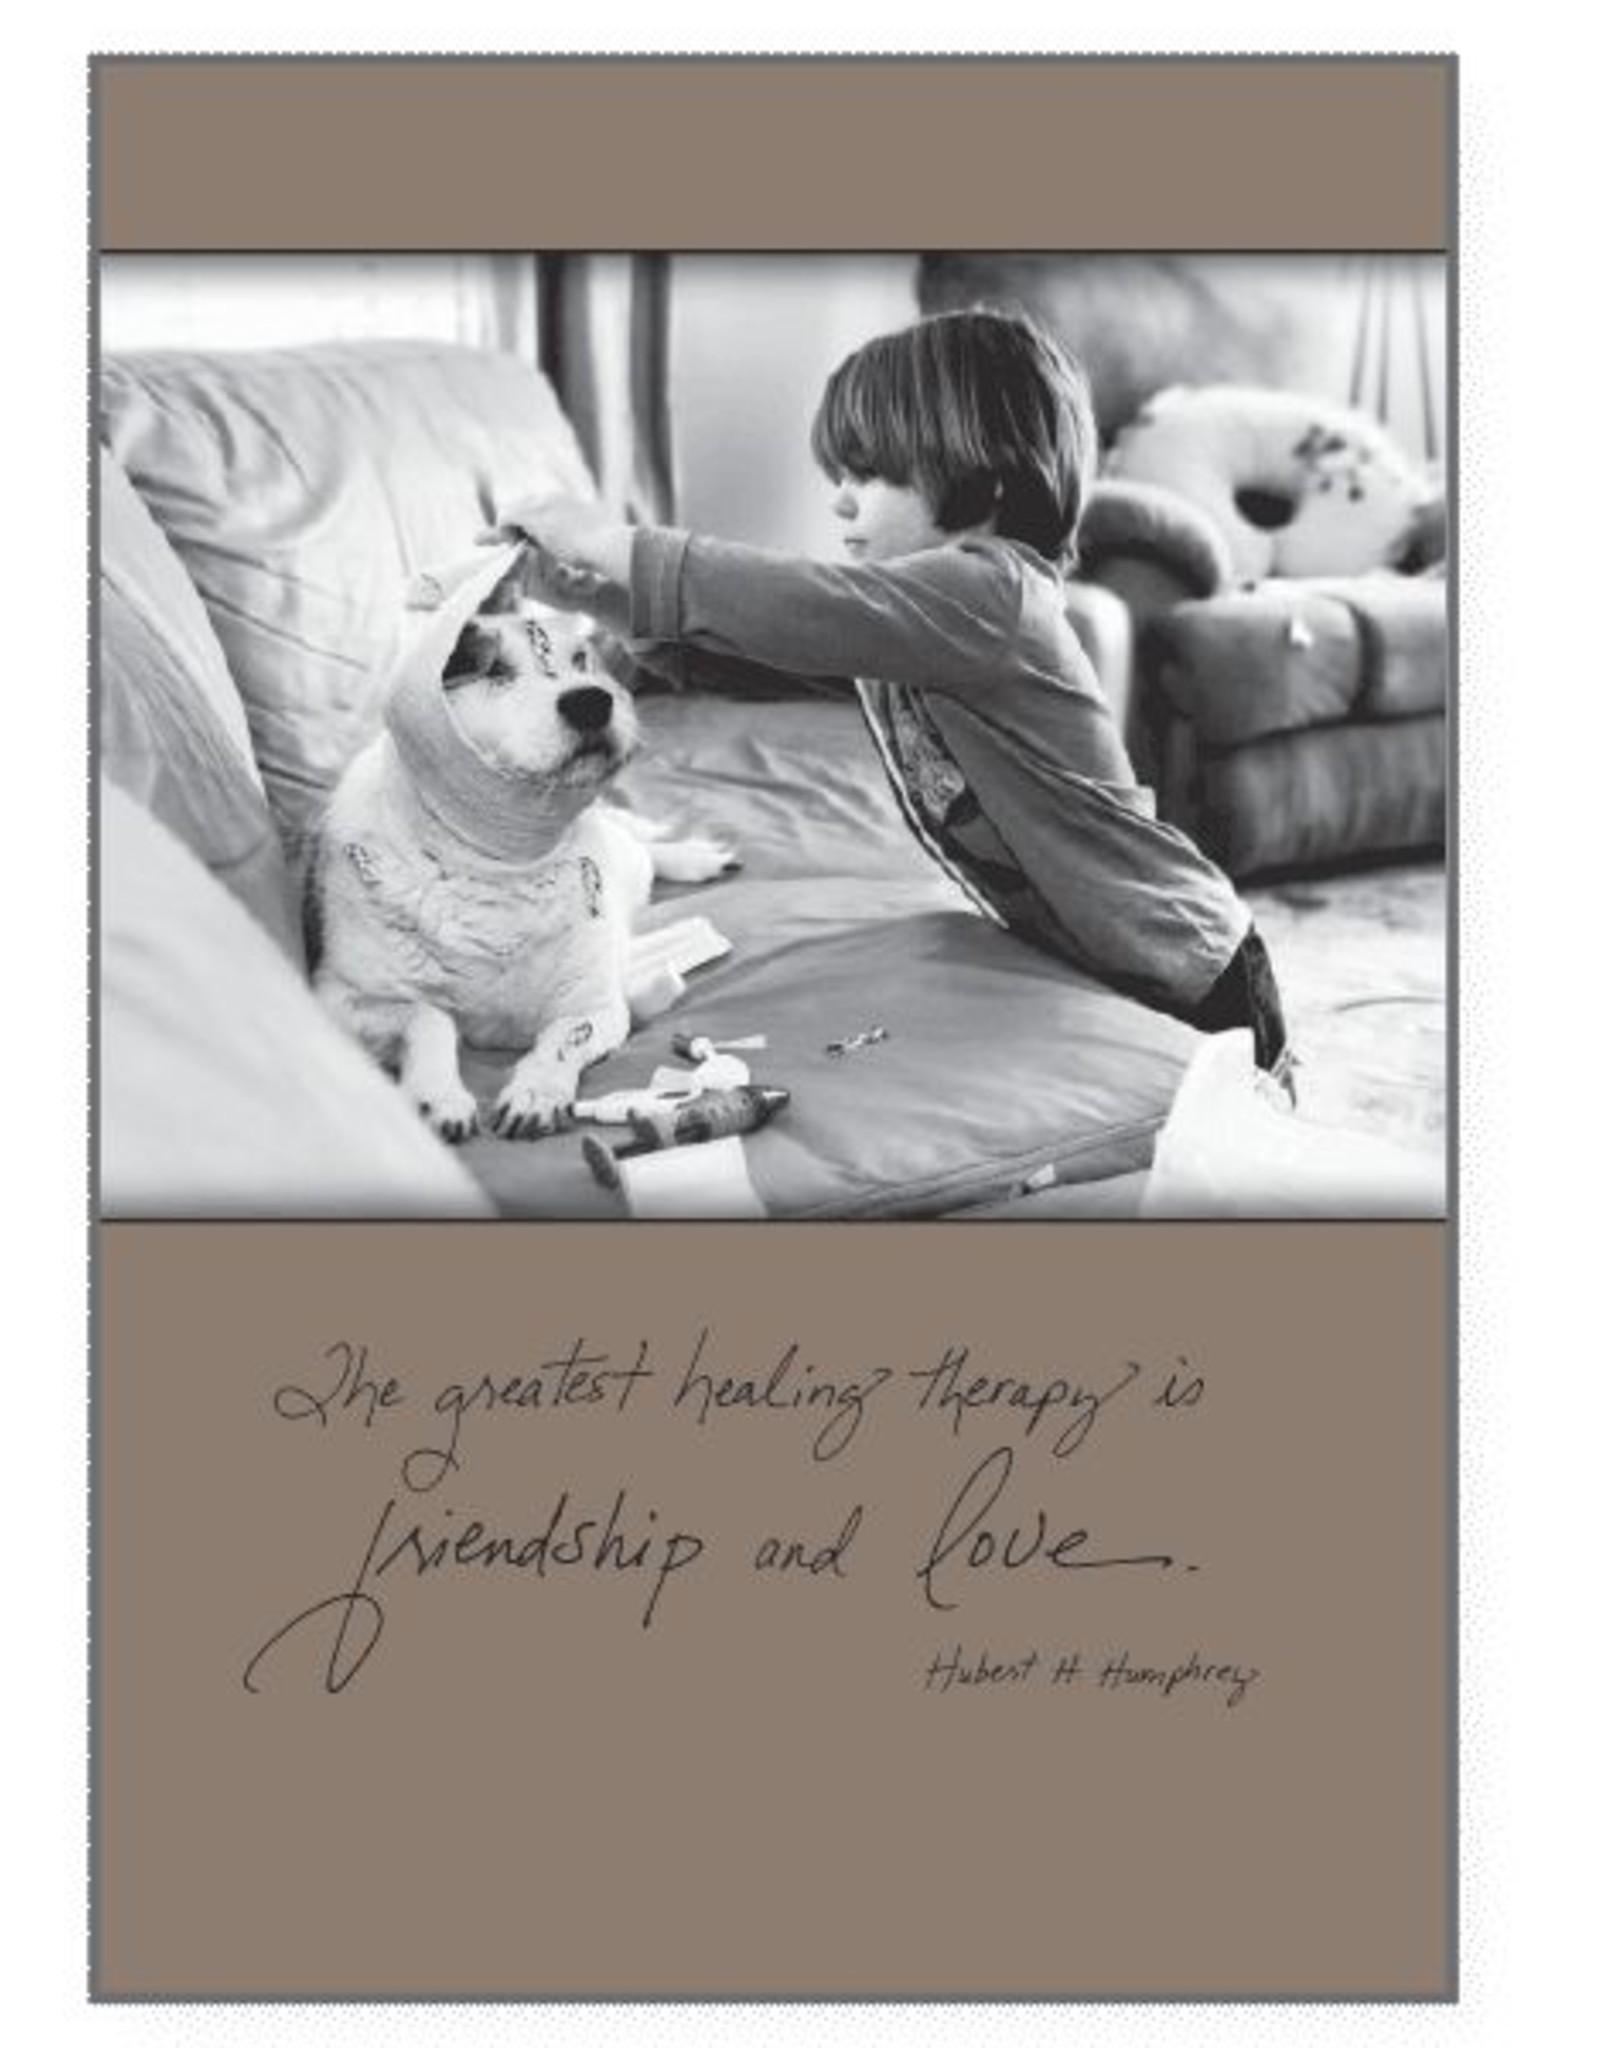 Dog Speak Dog Speak Card - Get Well - The Greatest Healing Therapy is Friendship & Love